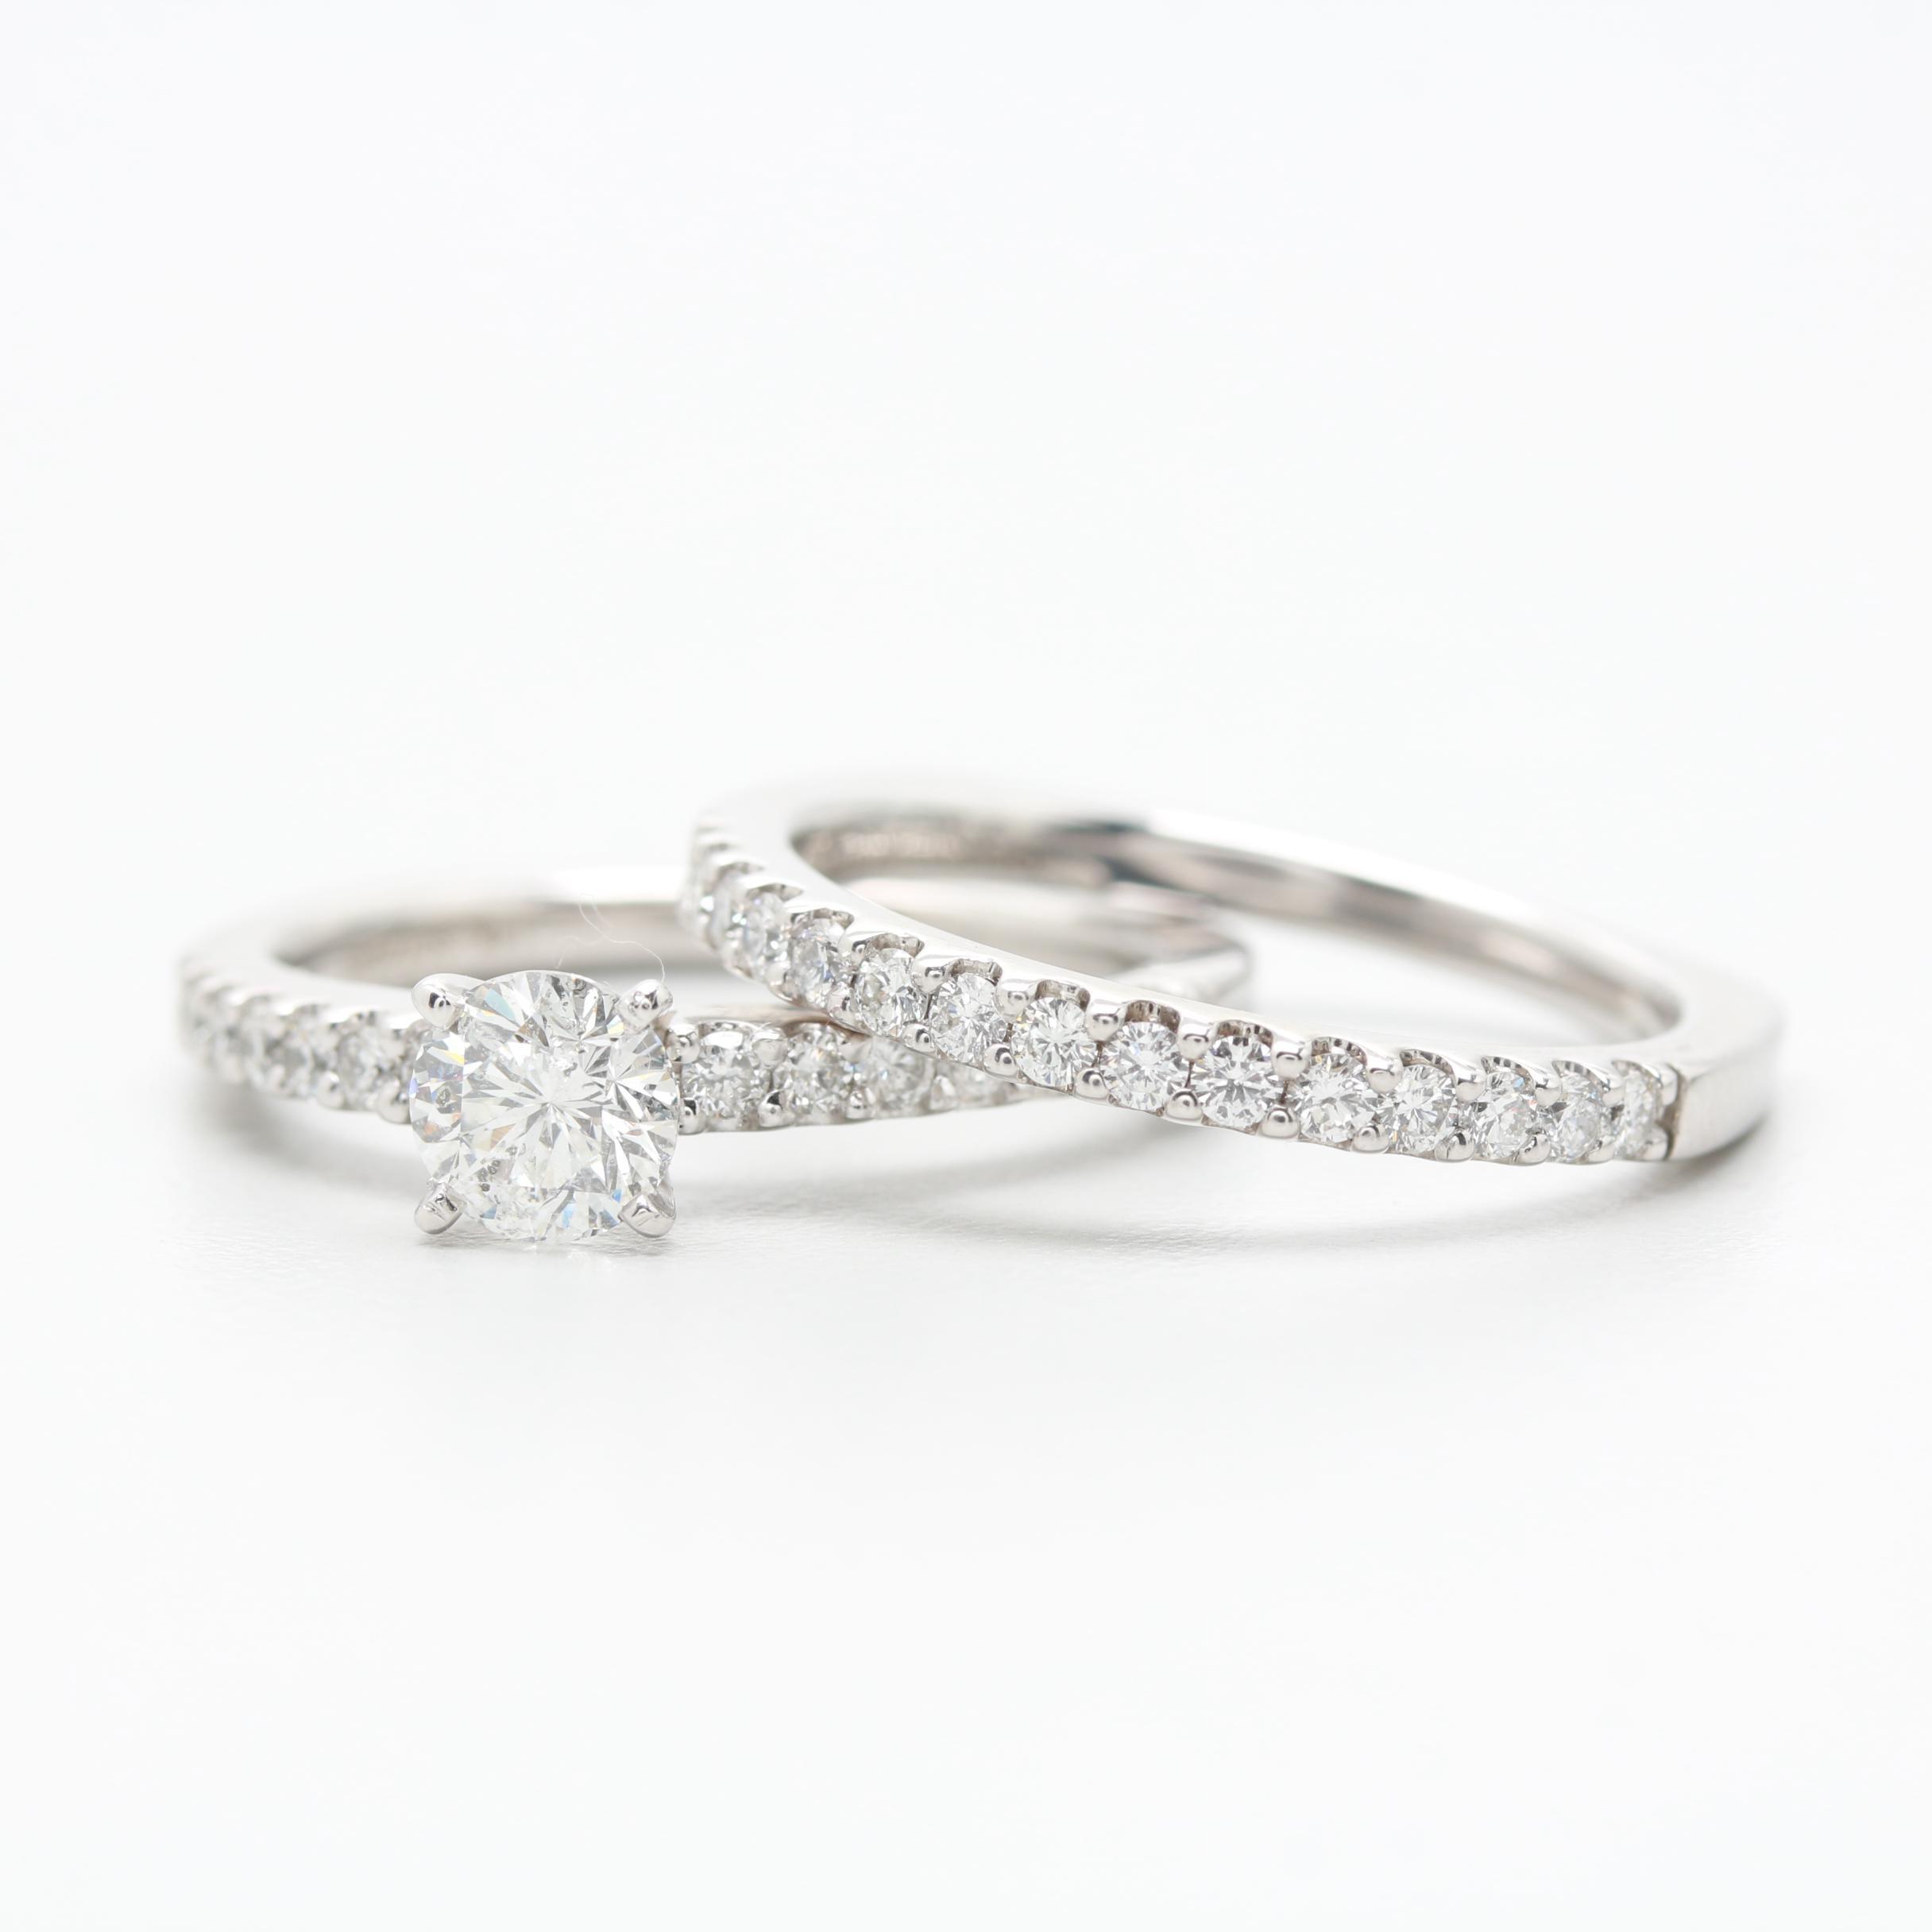 Gabriel and Co. 14K White Gold 1.45 CTW Diamond Euro Shank Ring Set